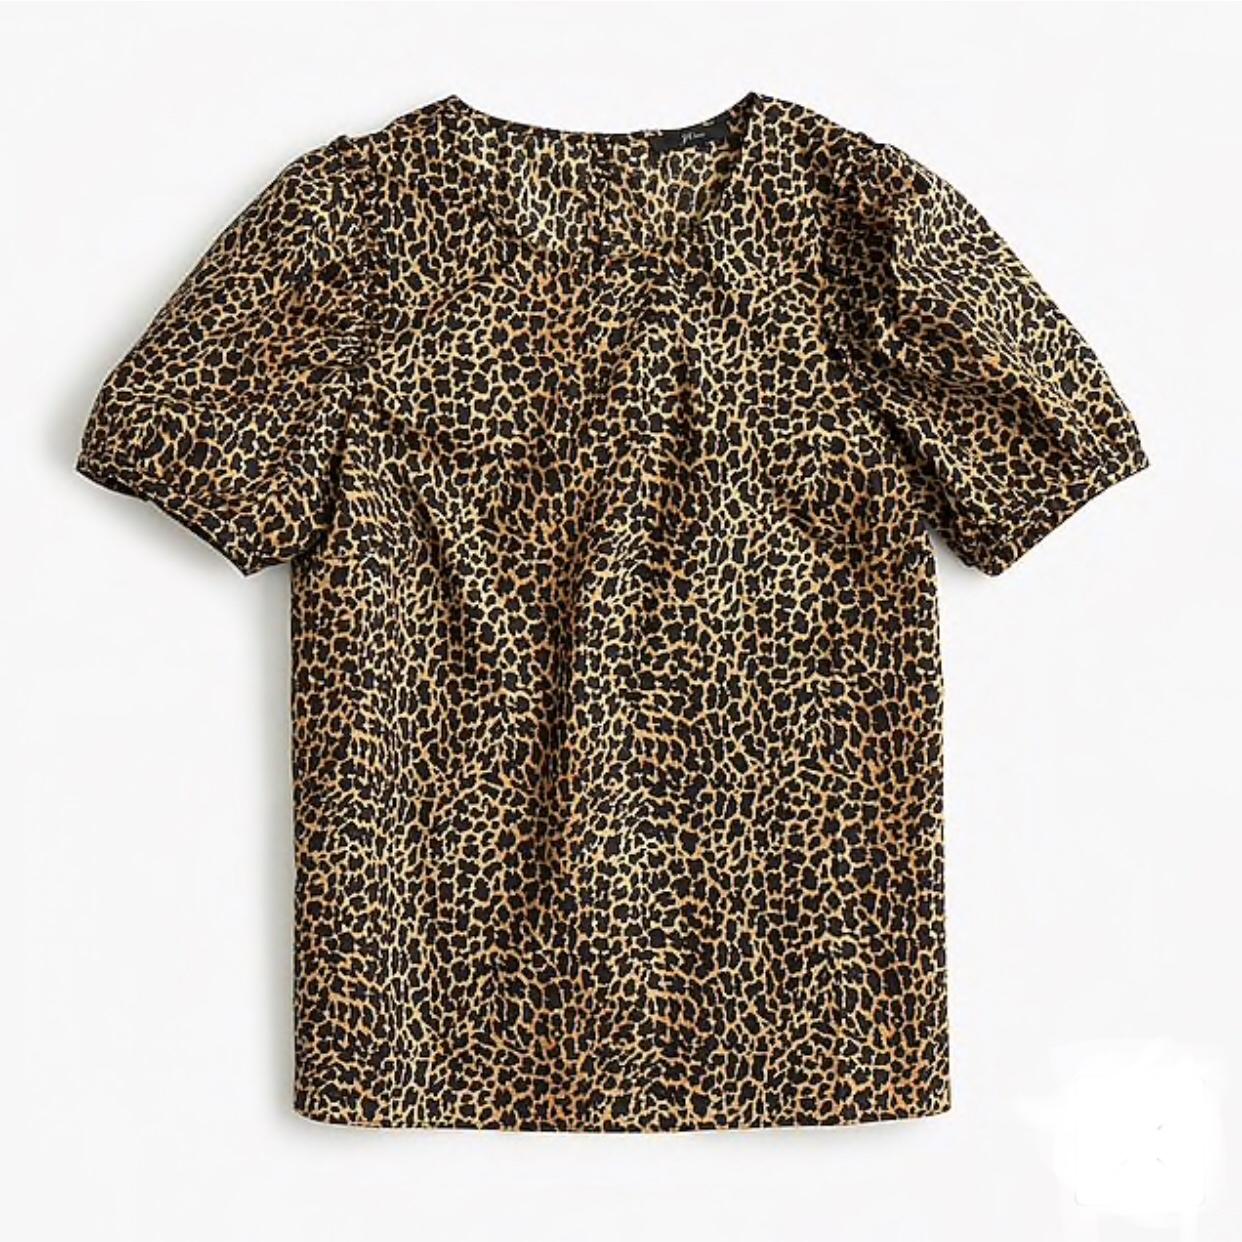 Puff-Sleeve Top in Leopard Print Cotton Poplin